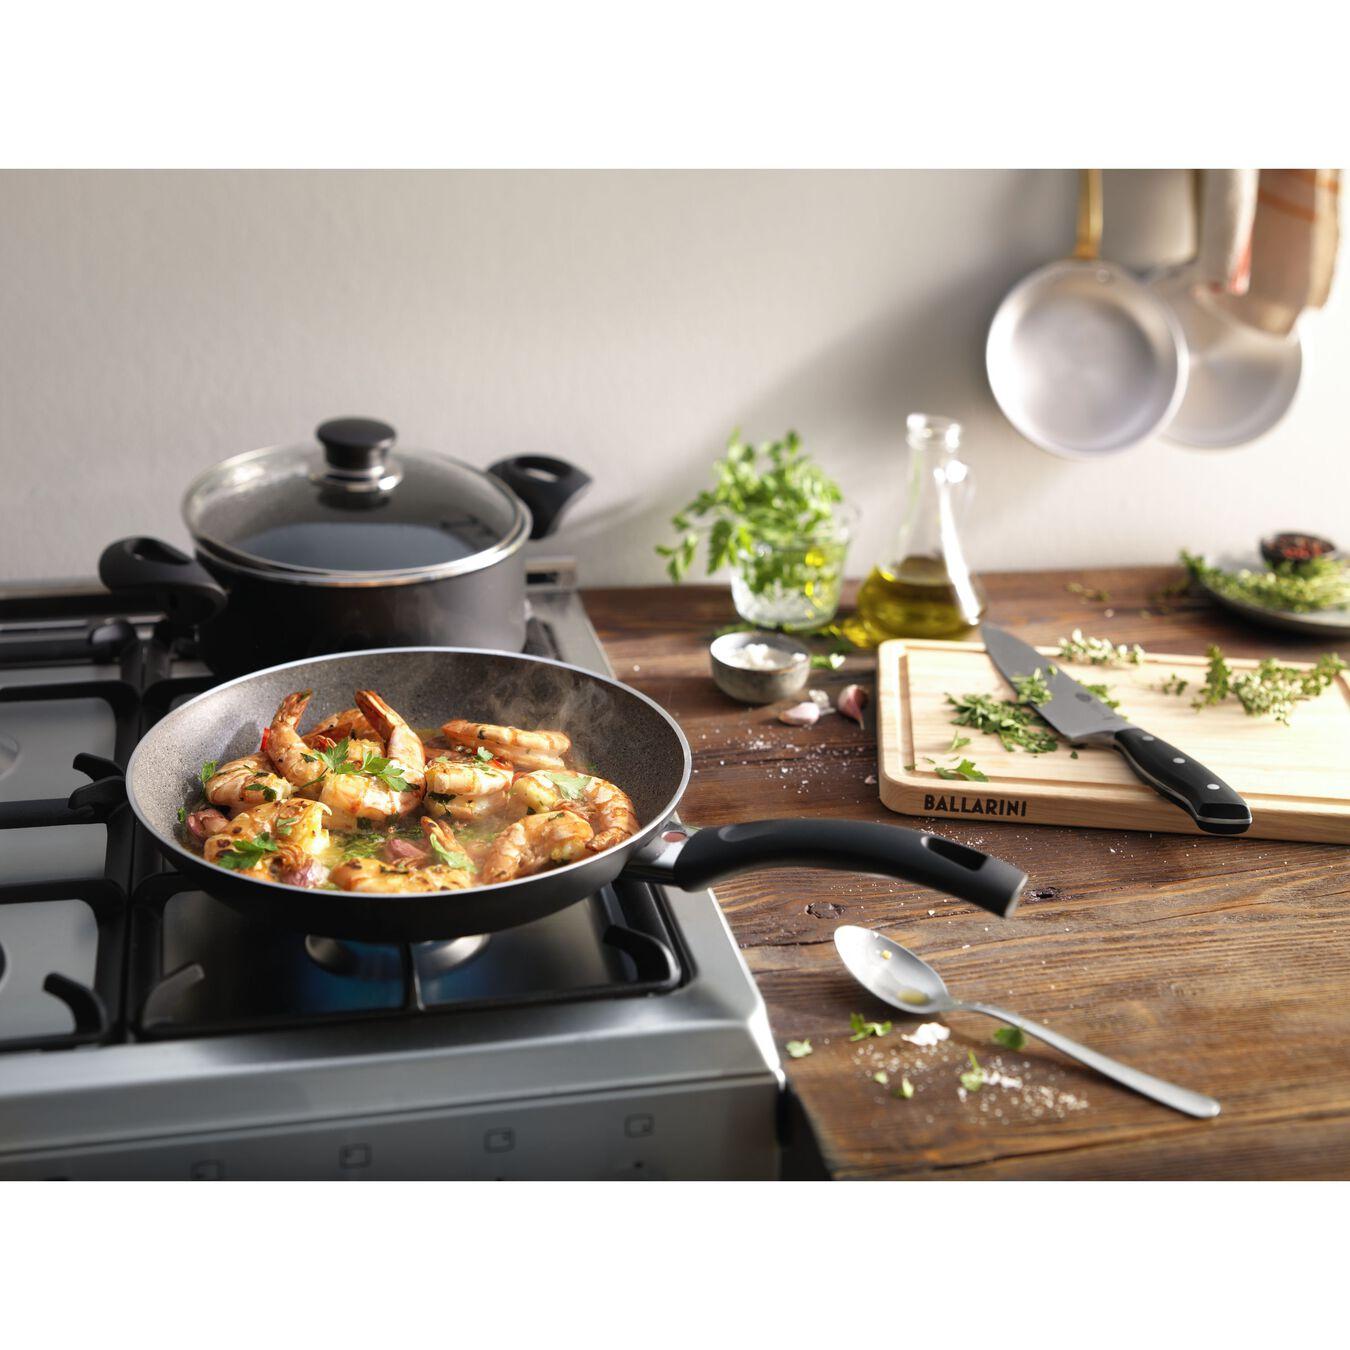 28 cm / 11 inch Aluminum Frying pan,,large 2